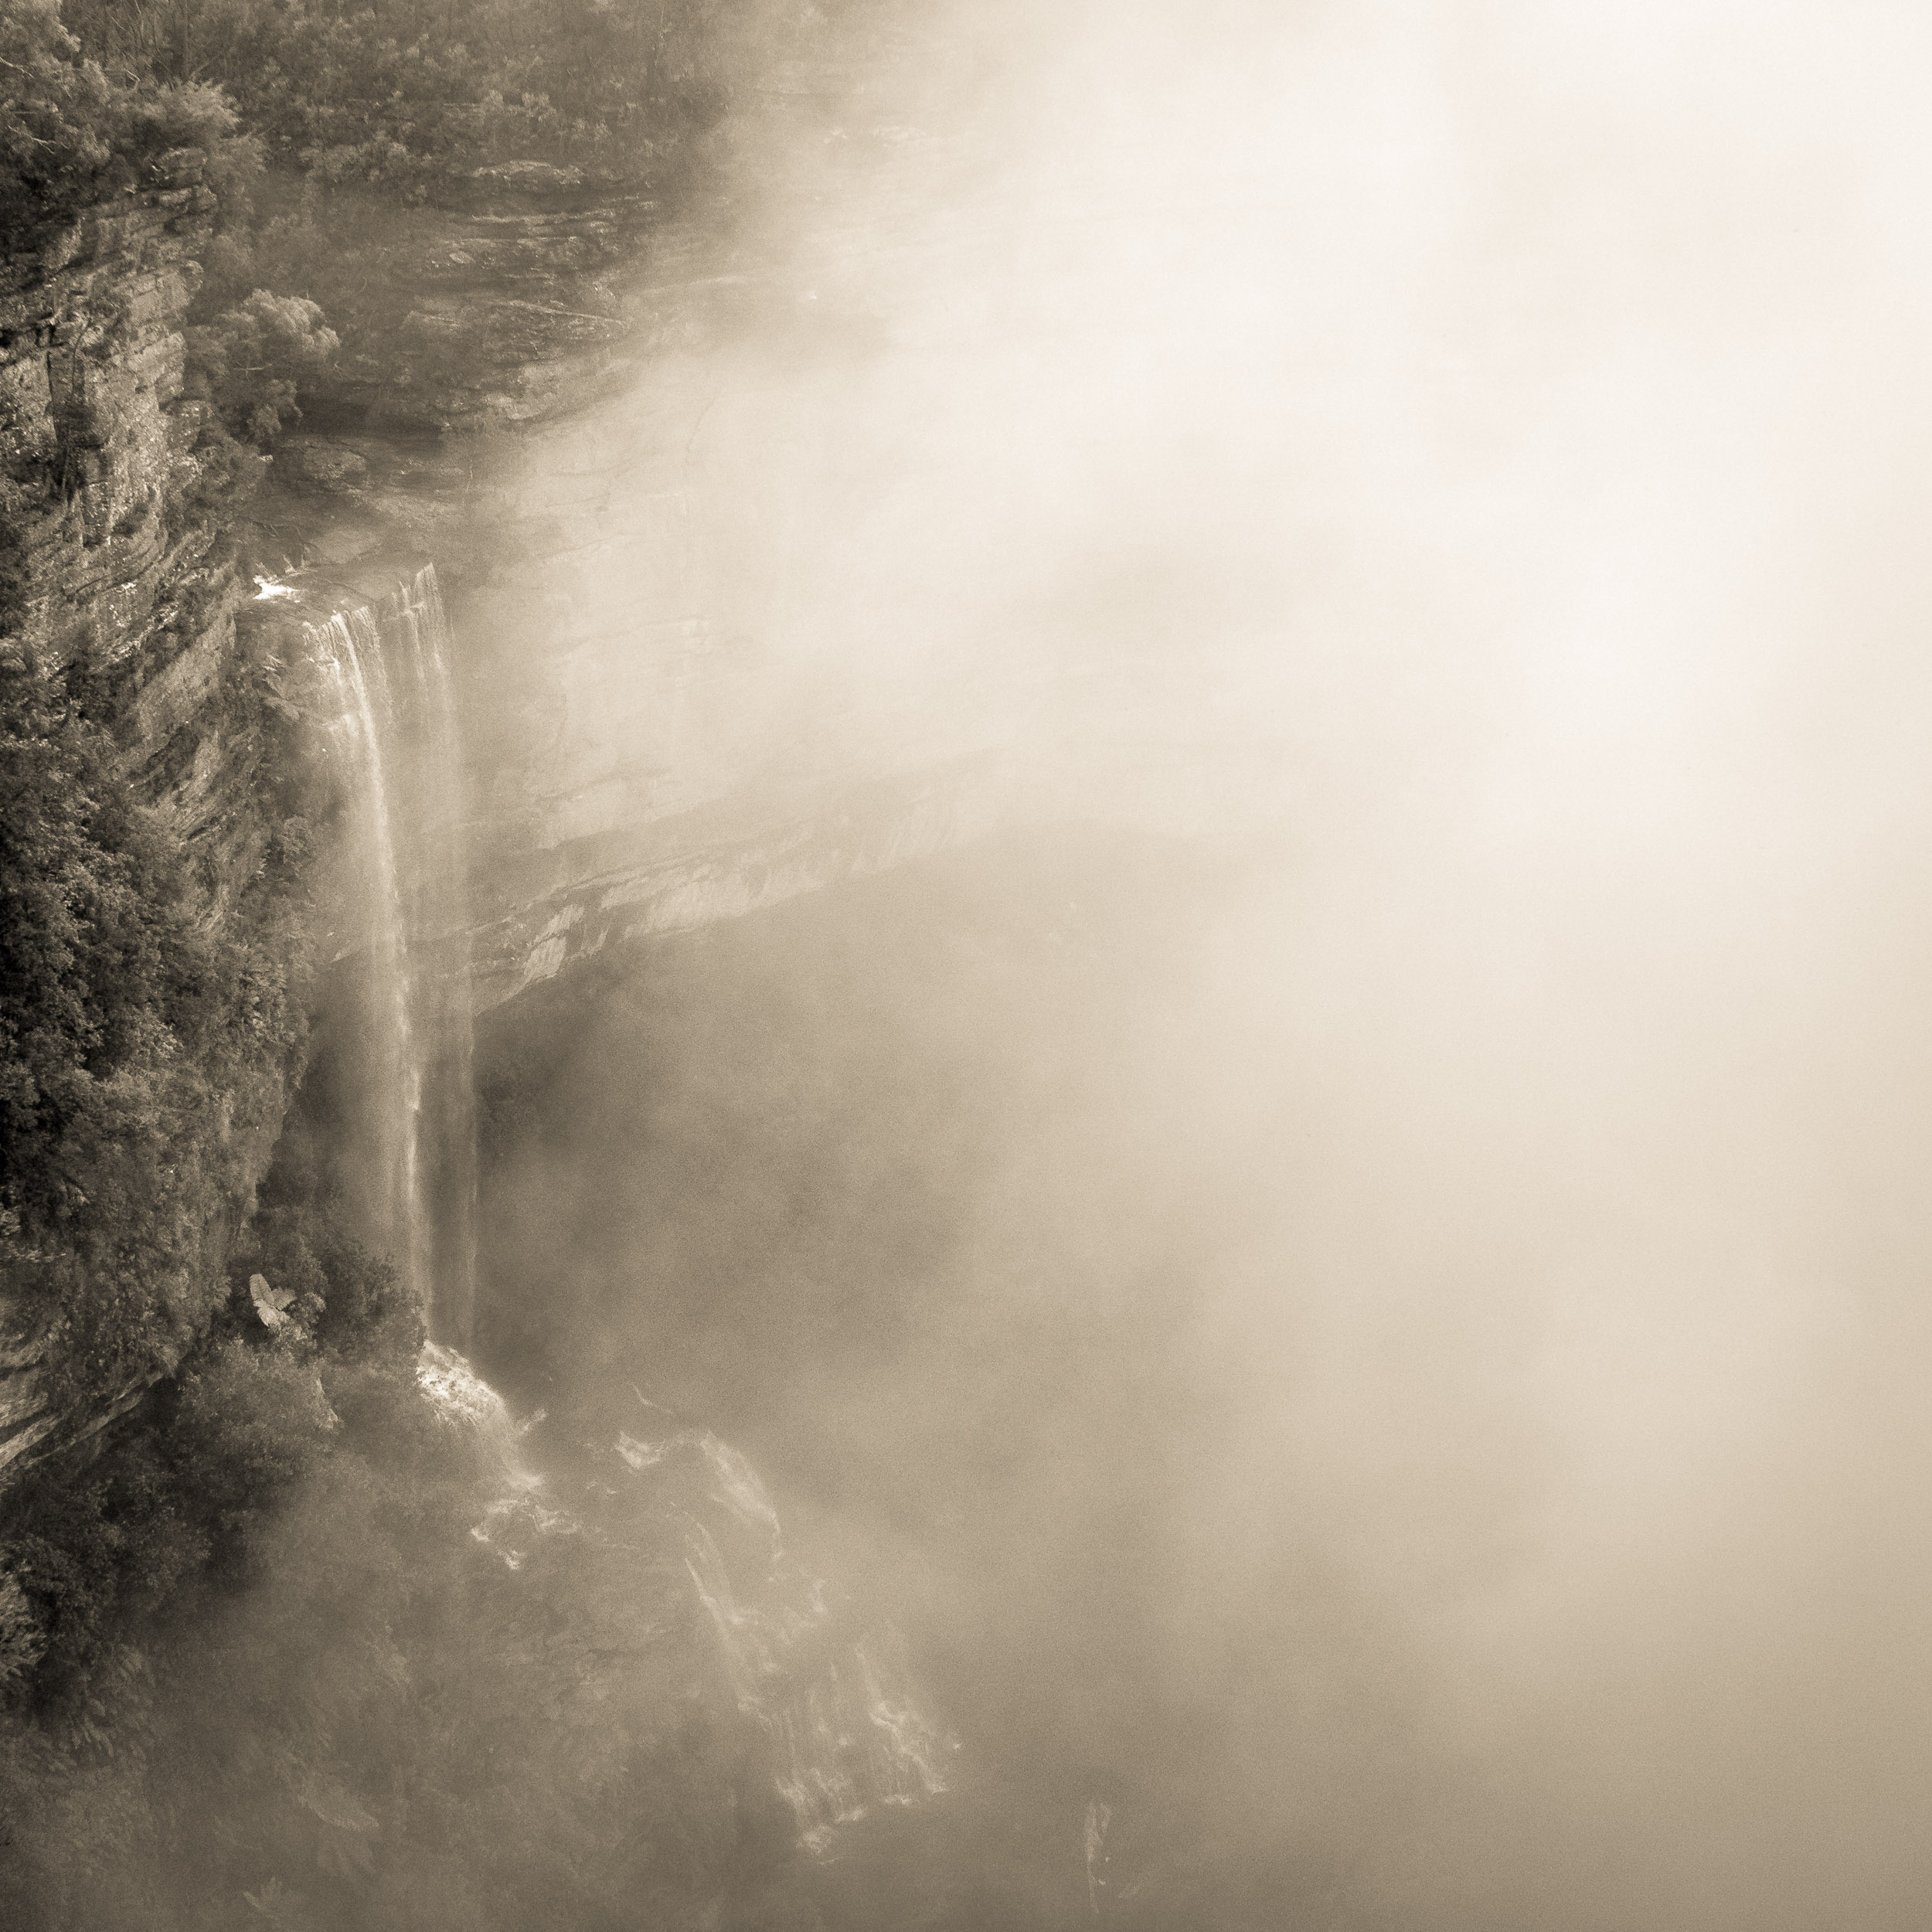 Katoomba Falls, The Greater Blue Mountains World Heritage Area Copyright © Len Metcalf